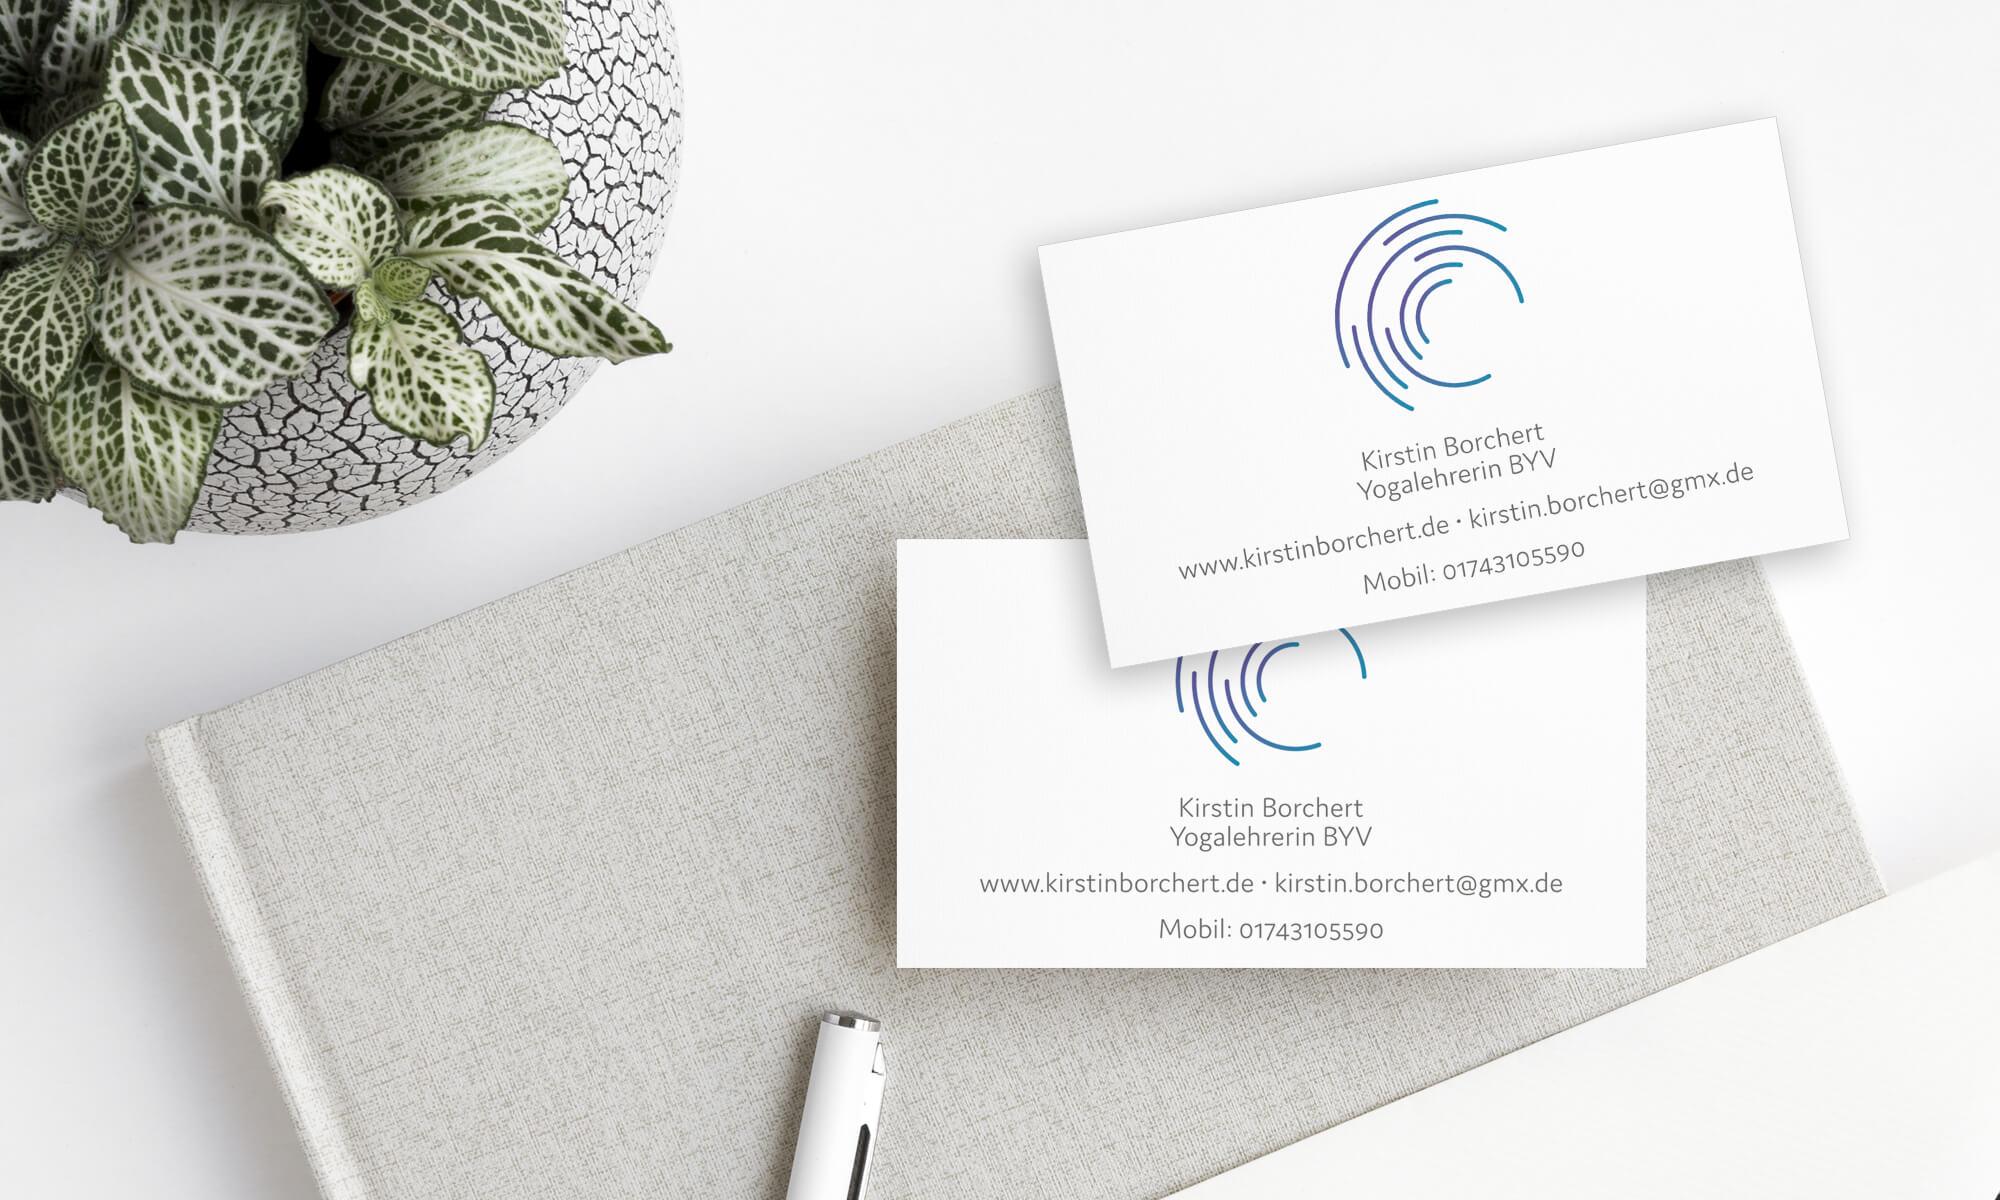 Kirstin Borchert – Visitenkarten